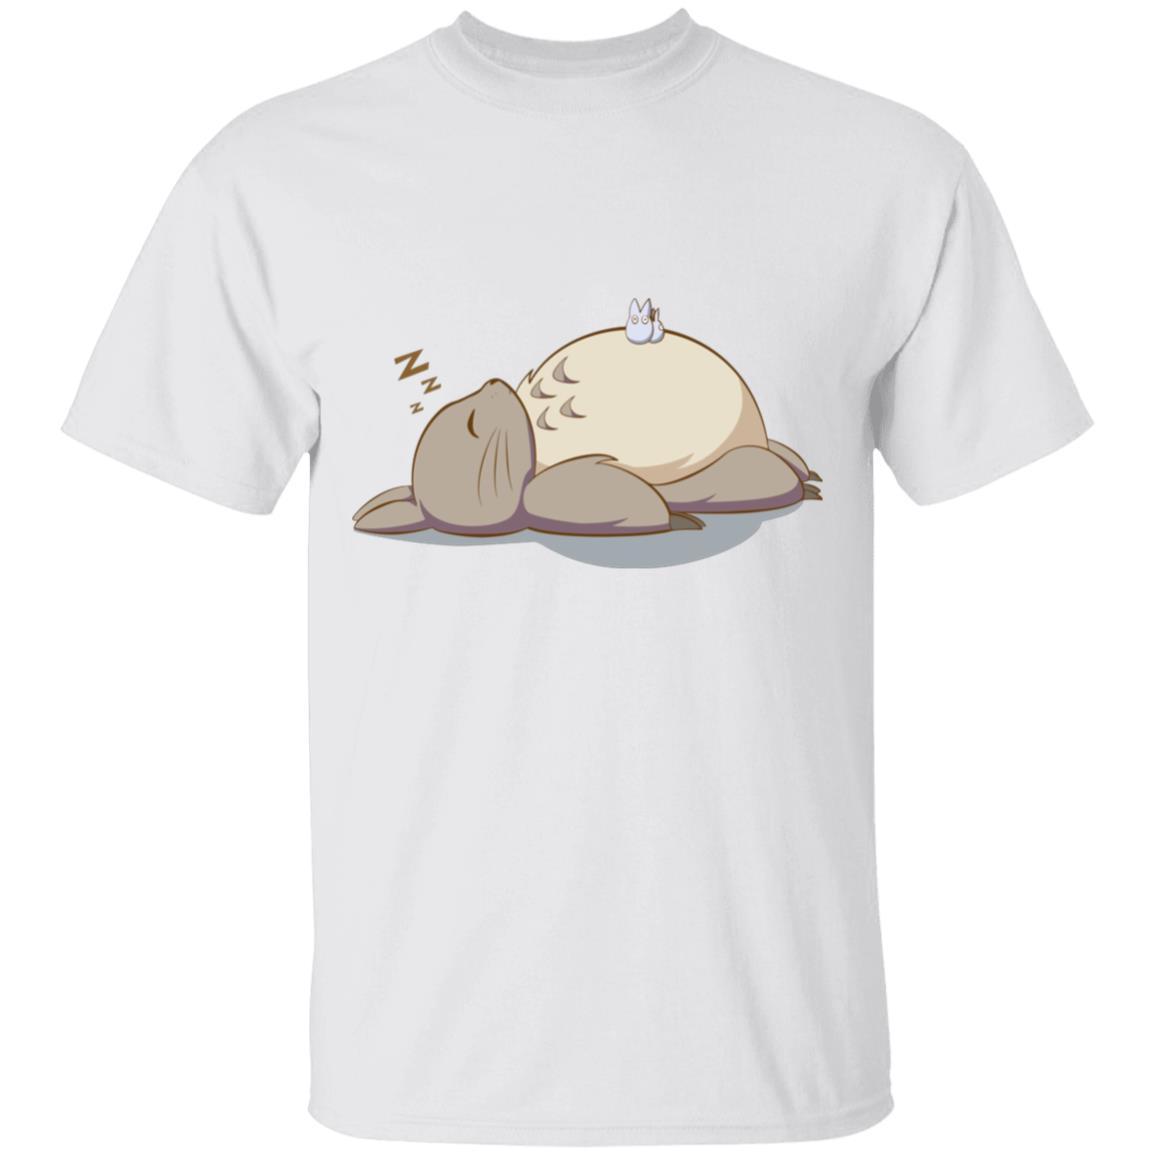 Cute Totoro Print T-Shirt For Women 12 Styles